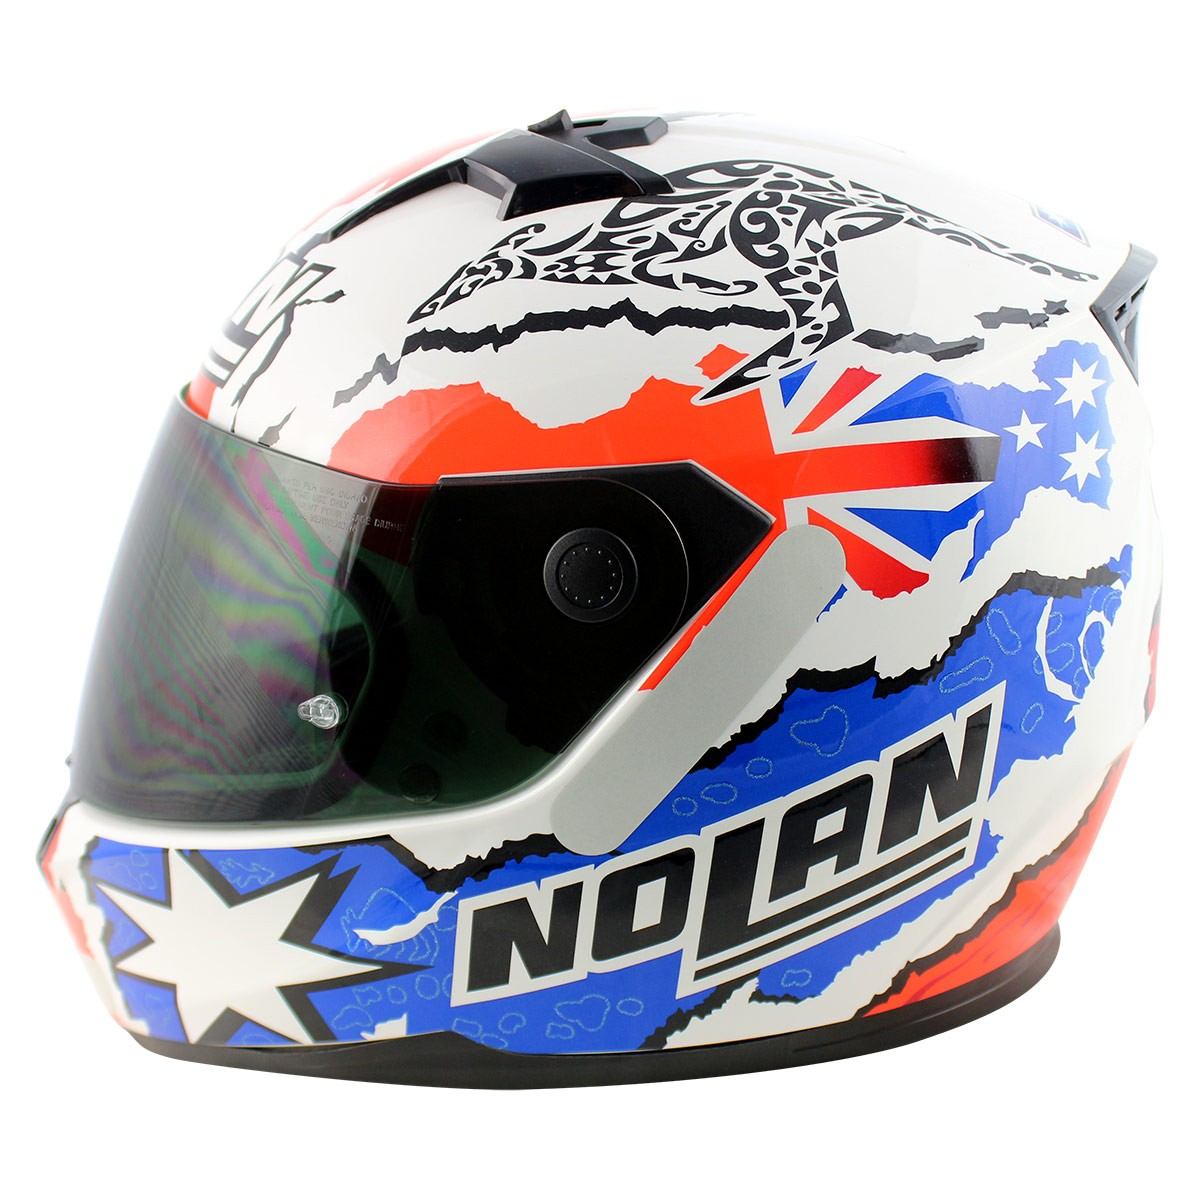 Capacete Nolan N64 Réplica Gemini Stoner   - Planet Bike Shop Moto Acessórios